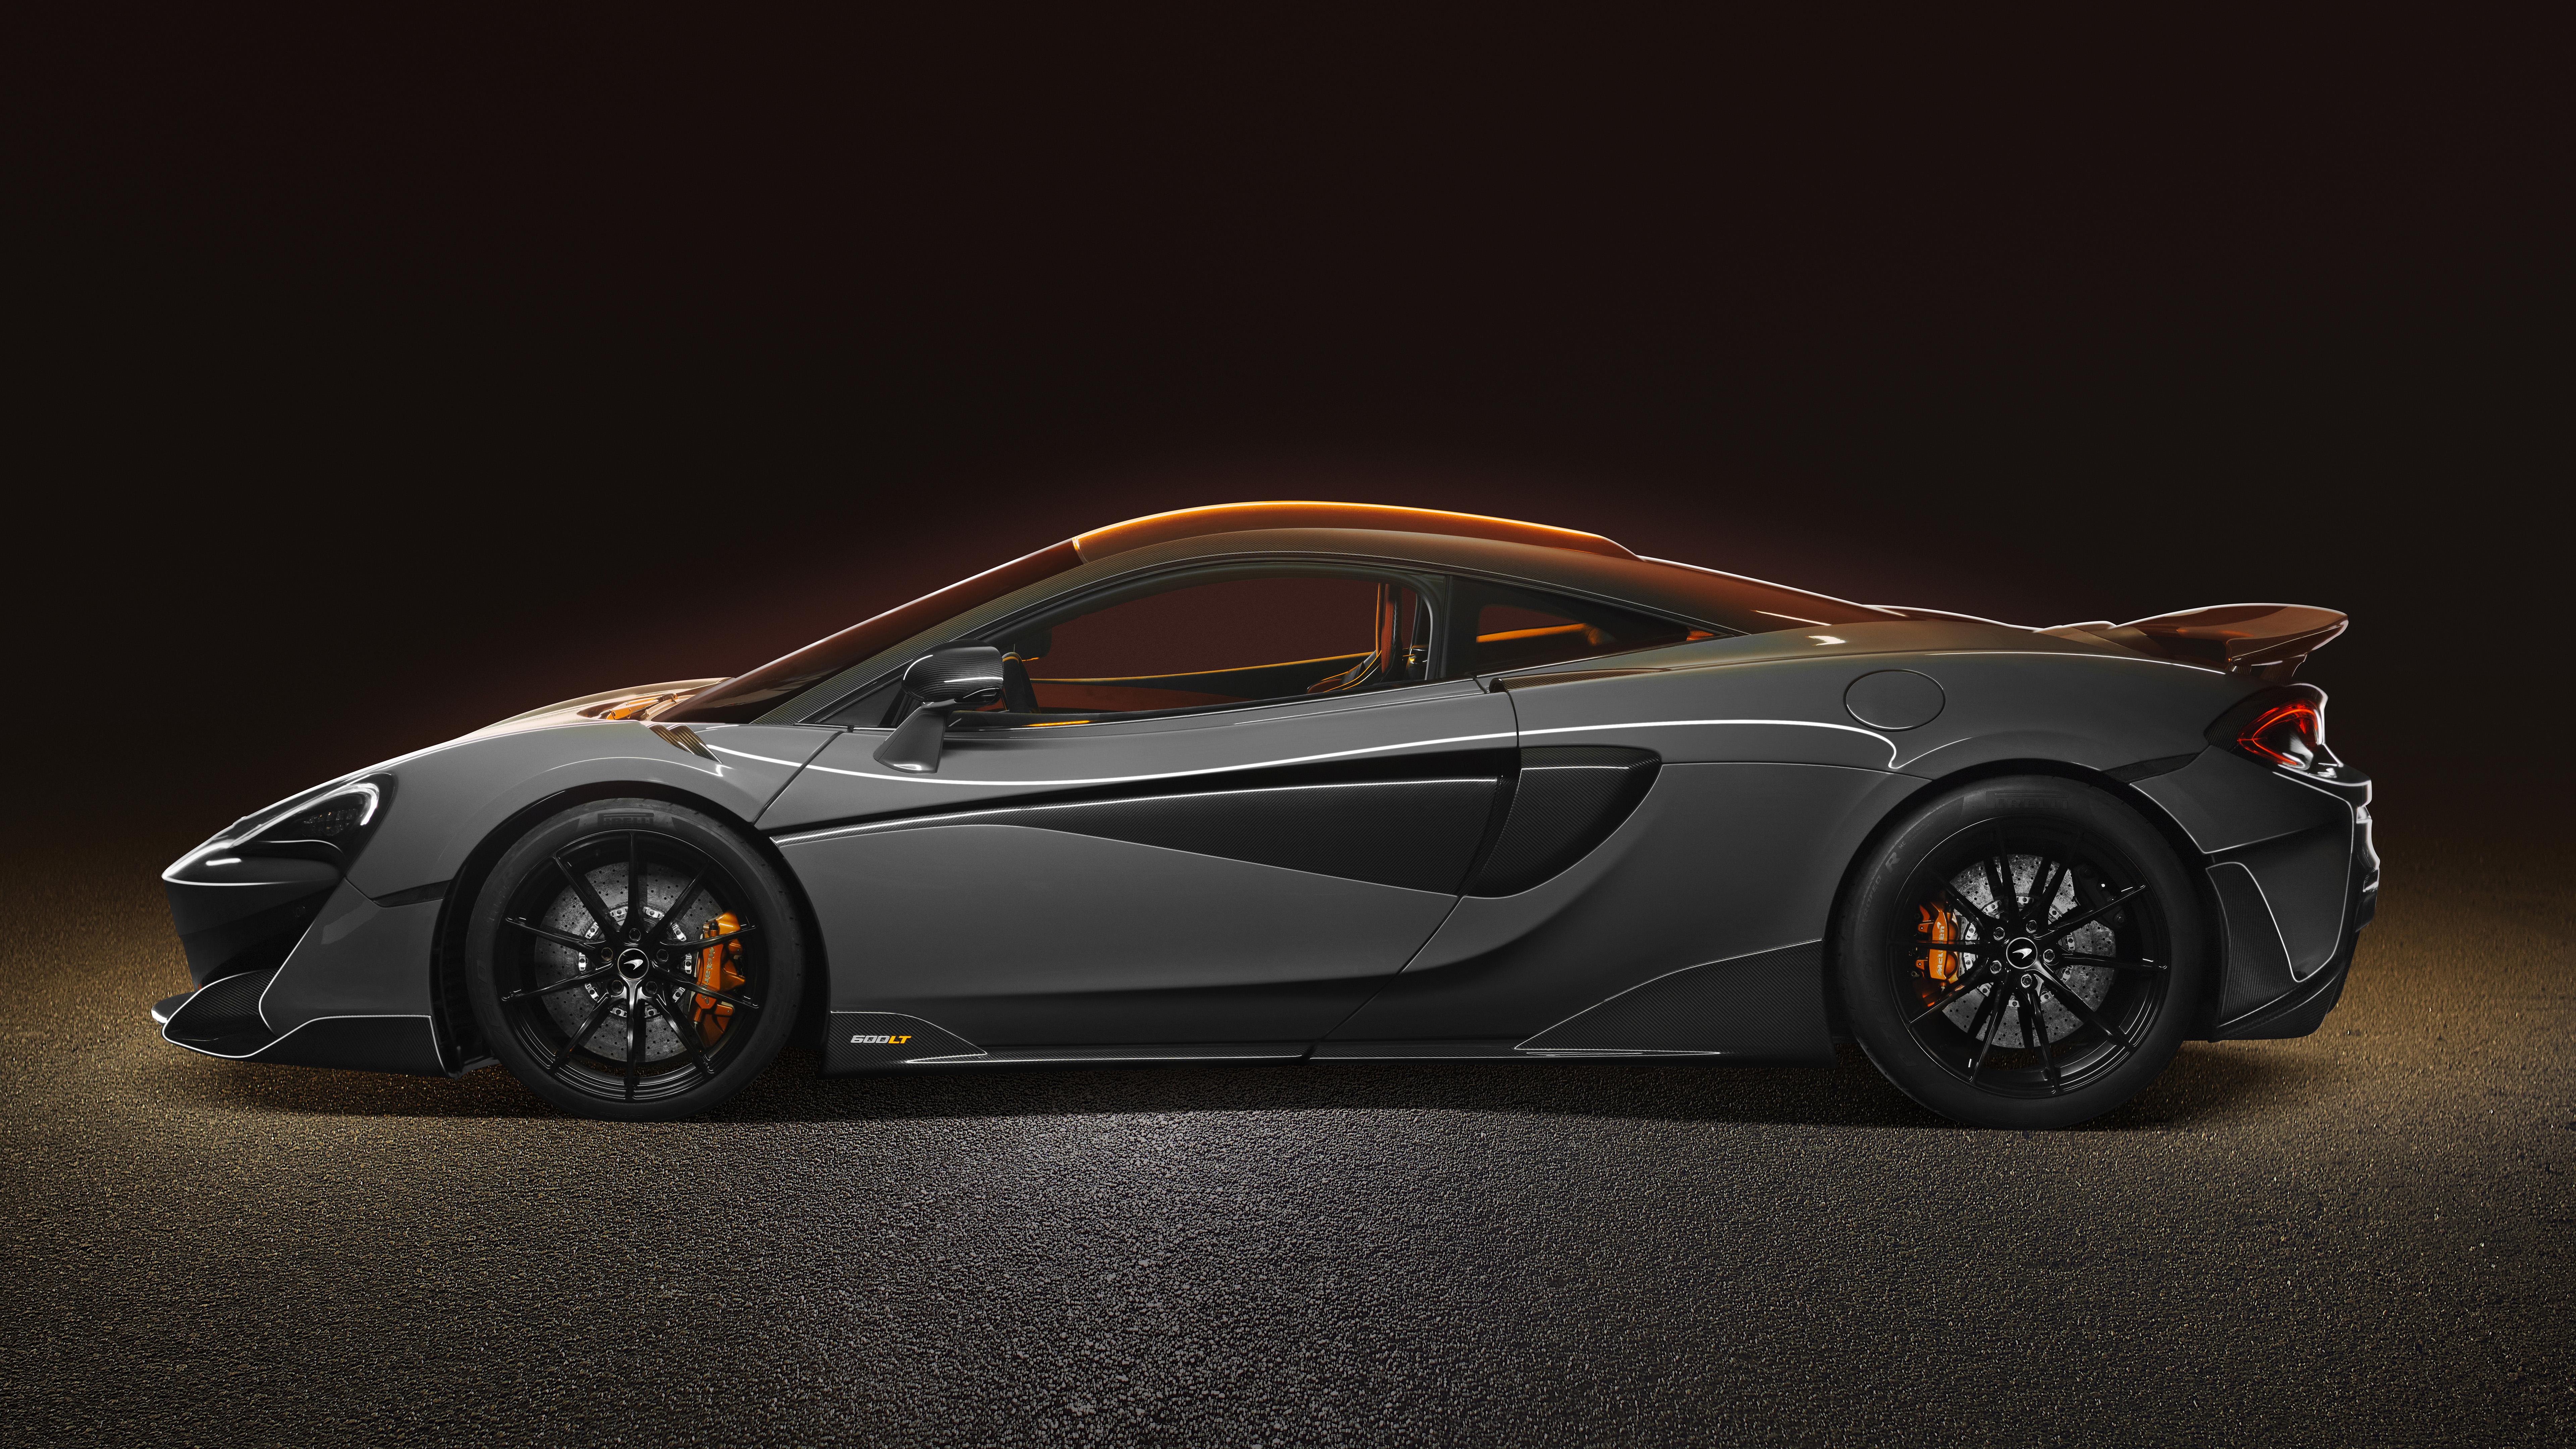 McLaren 600LT 2019 4K 8K 5 Wallpaper HD Car Wallpapers